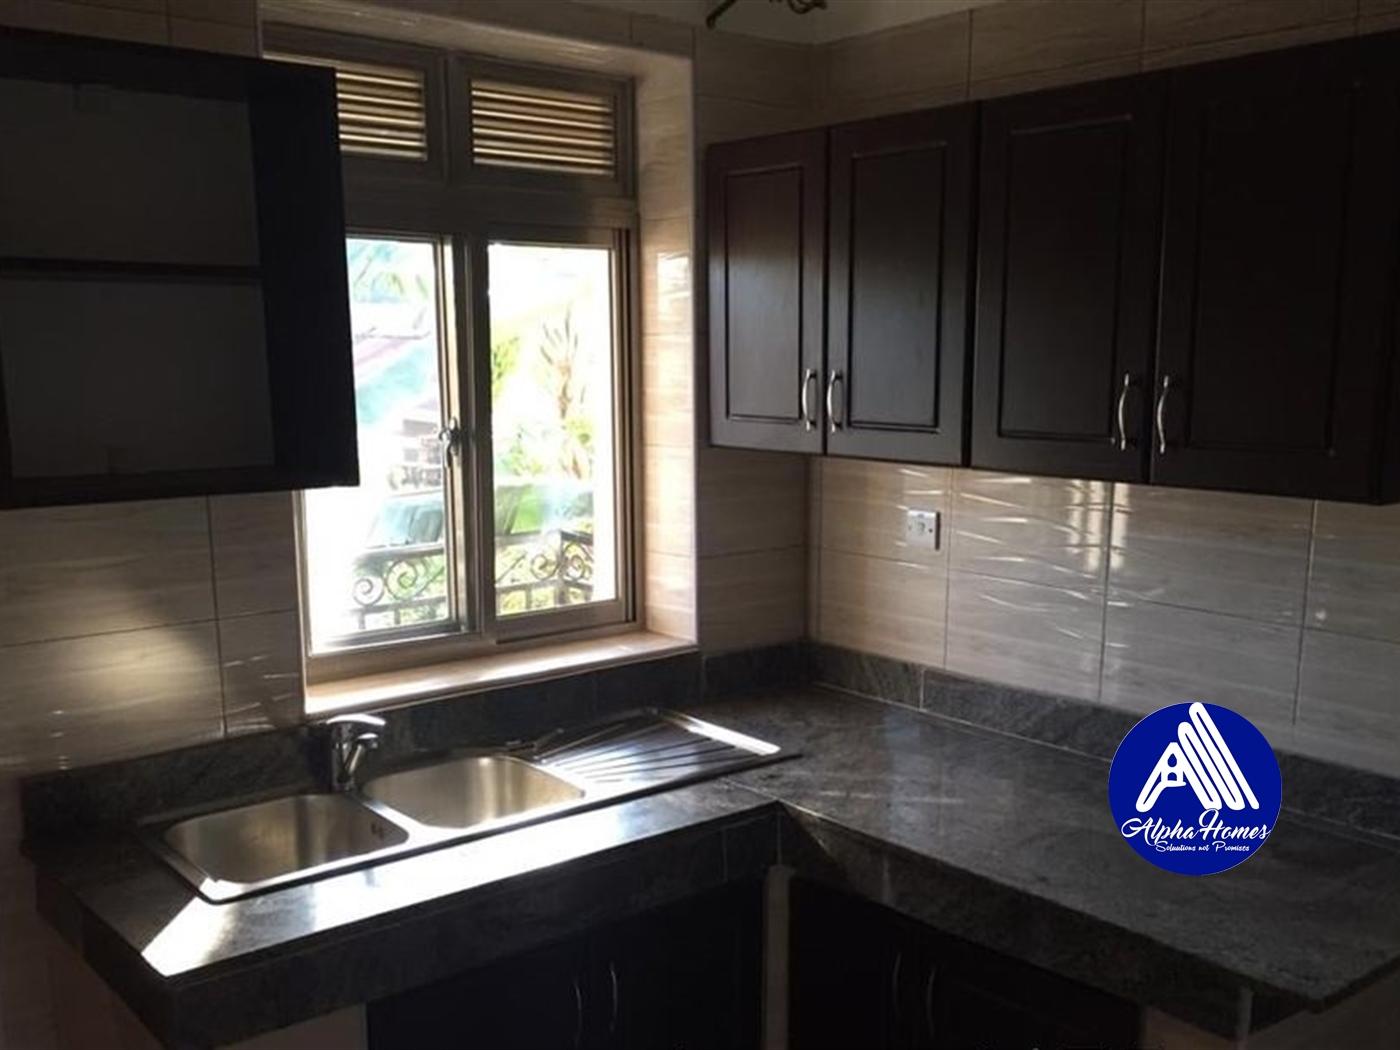 Apartment for rent in Luzira Wakiso